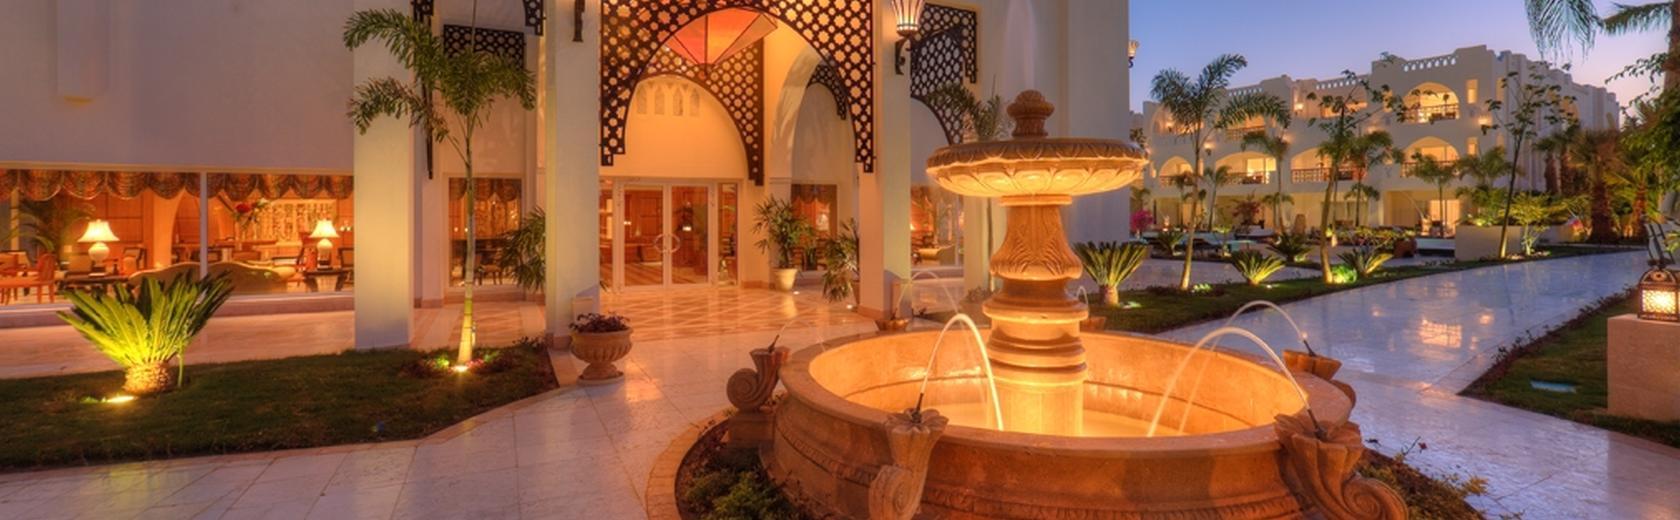 Le Royale Sonesta Collection Luxury Resort image2